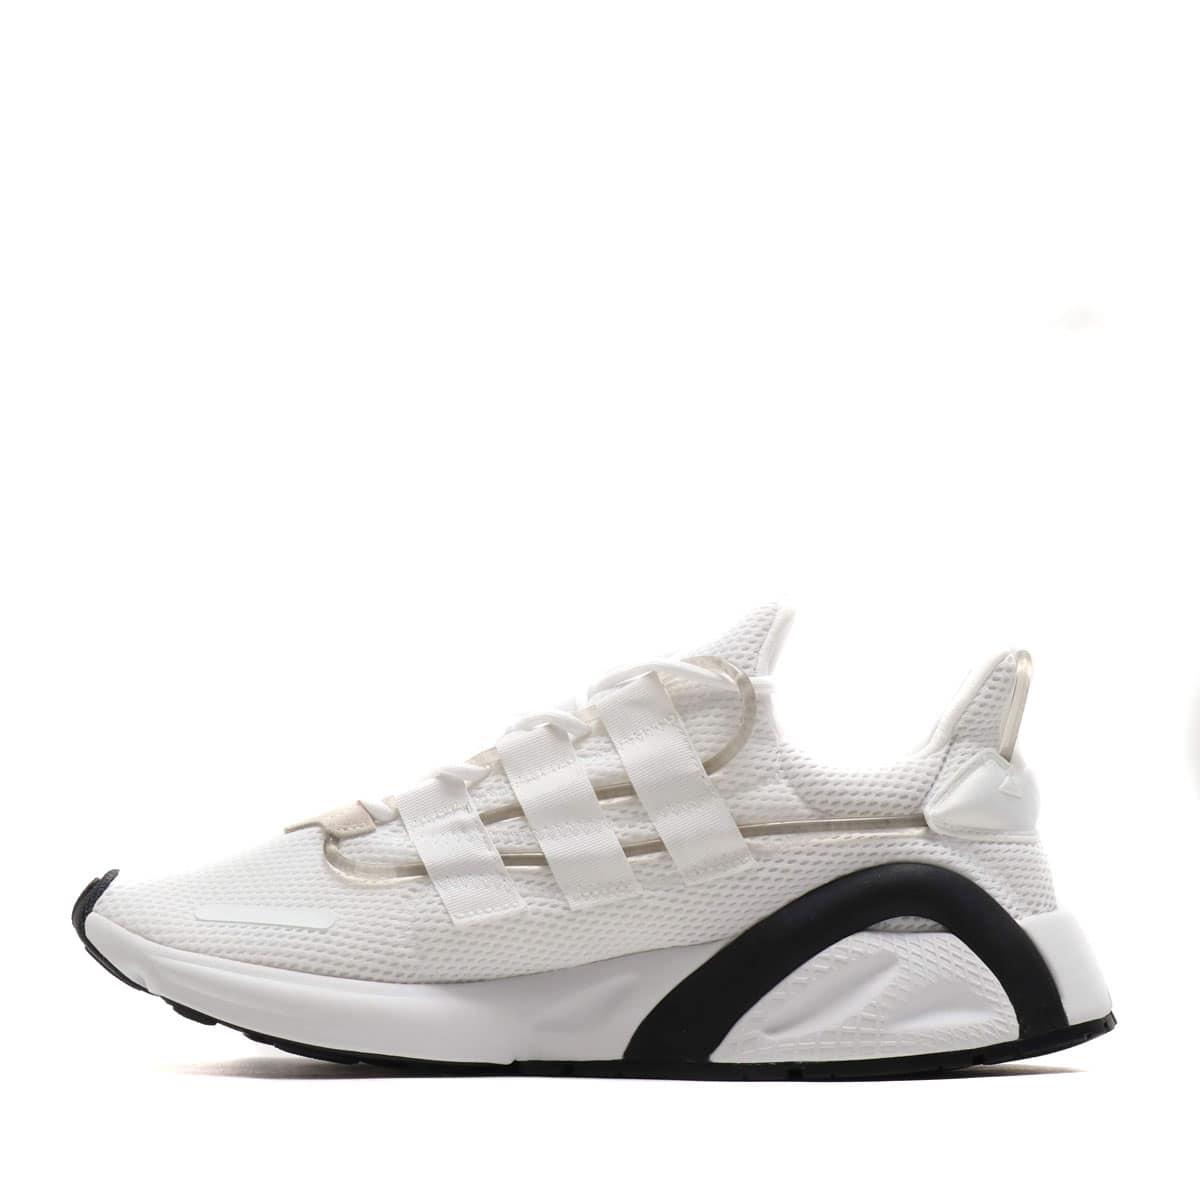 """adidas LXCON ランニングホワイト/ランニングホワイト/ブライトイエロー 19SS-S""_photo_3"